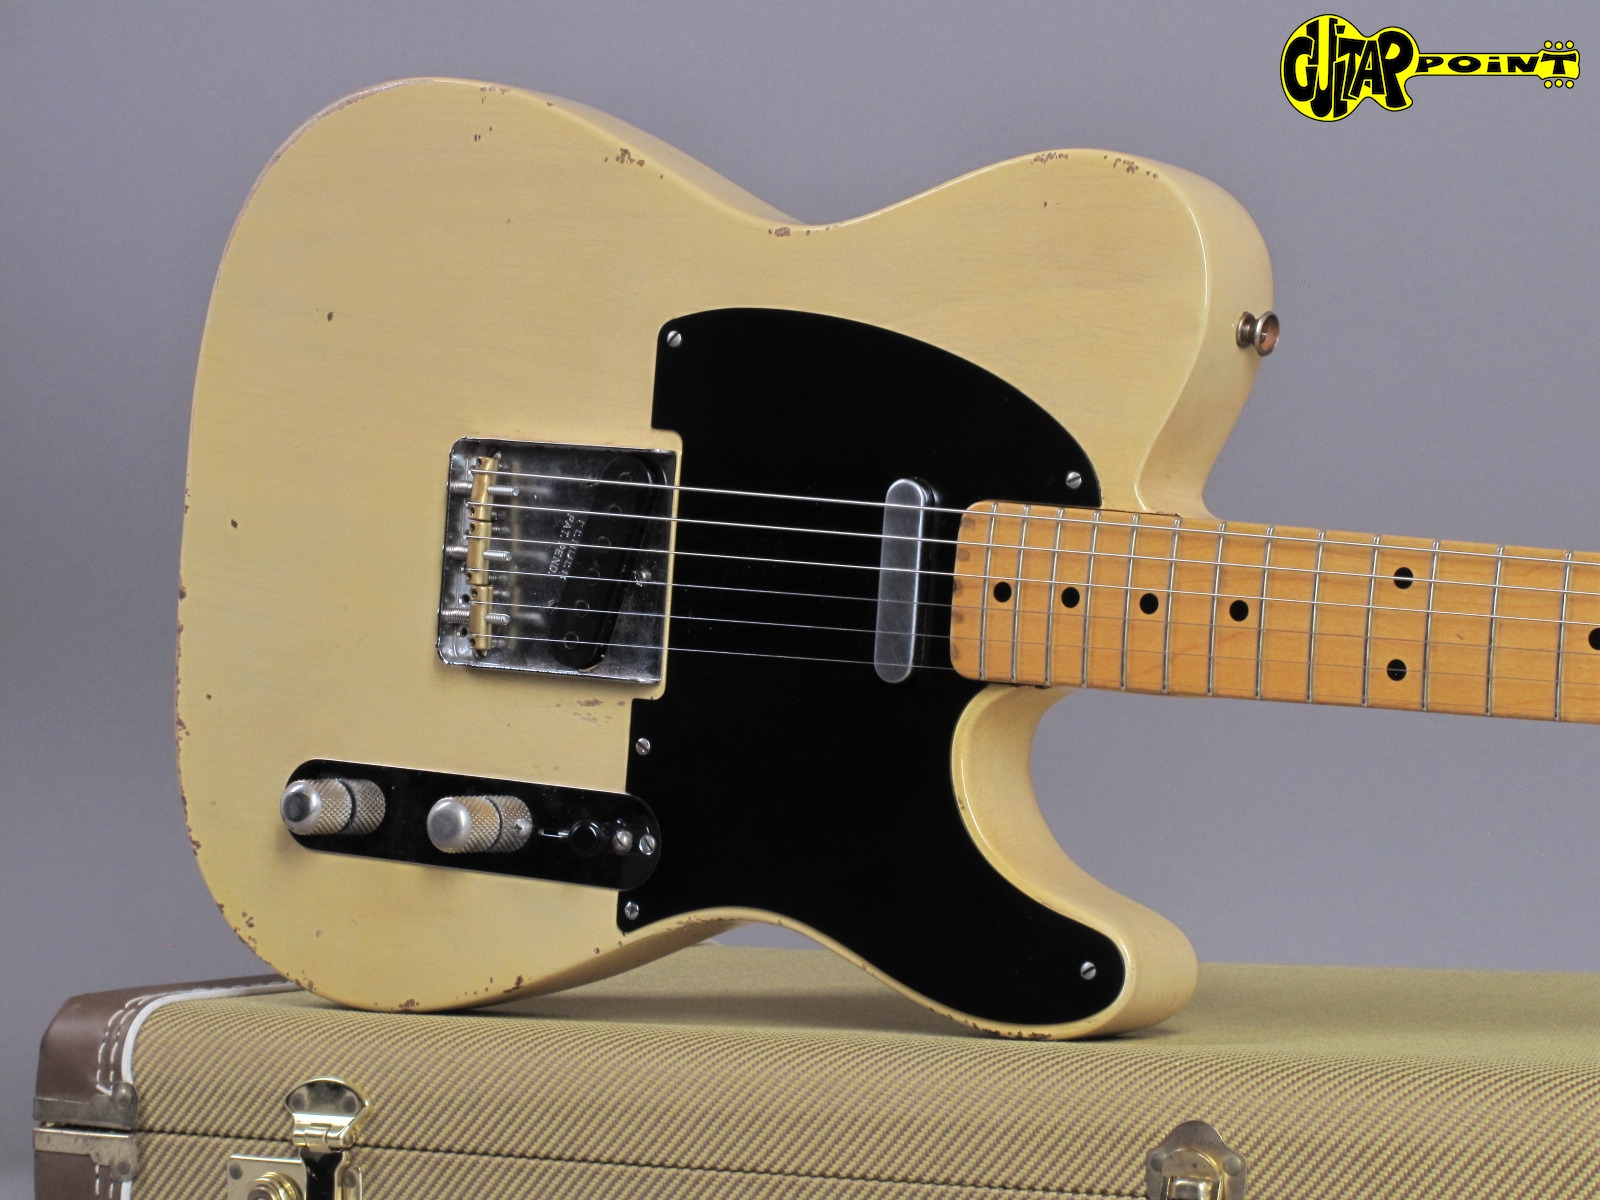 https://guitarpoint.de/app/uploads/products/fender-underwood-telecaster-blond-ex-kirk-fletcher/Fender53Tele_KFletscher_19.jpg